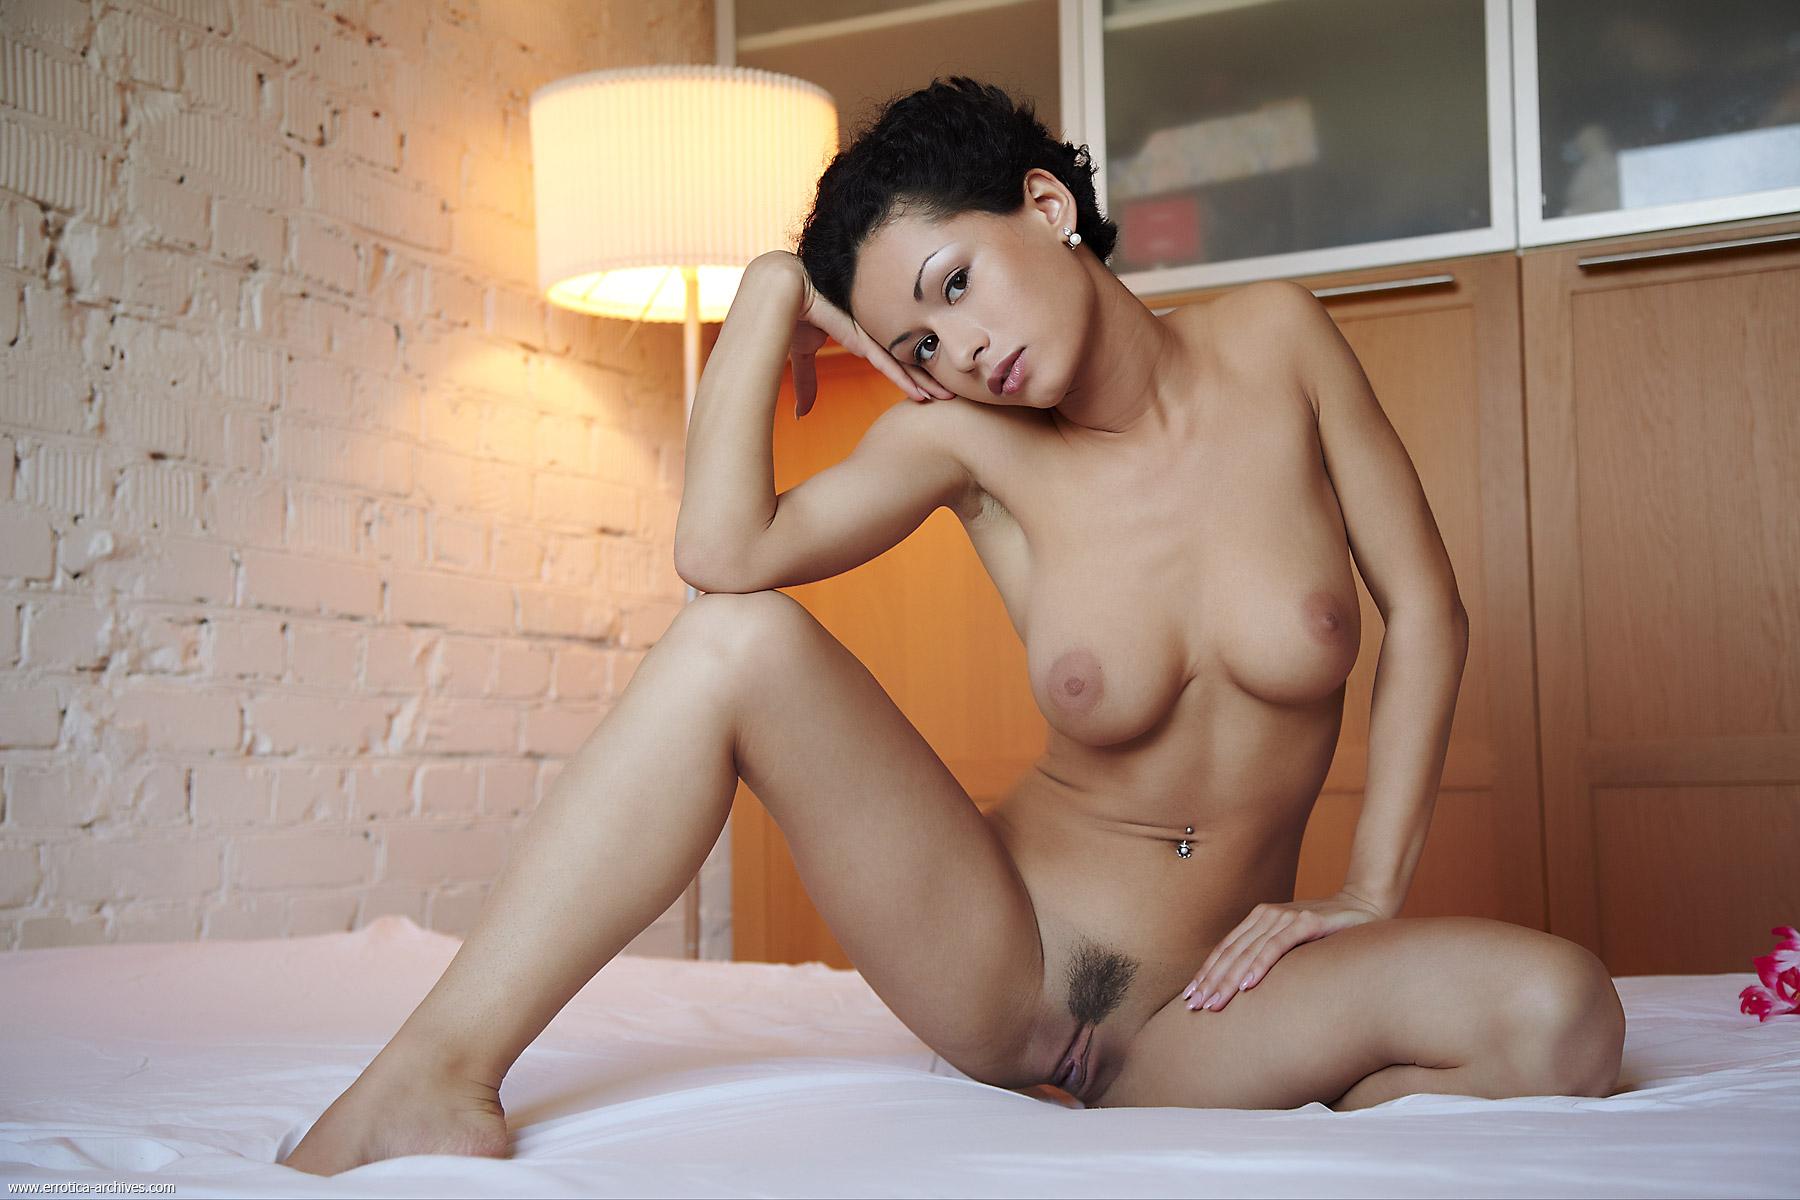 krasivie-bryunetki-erotika